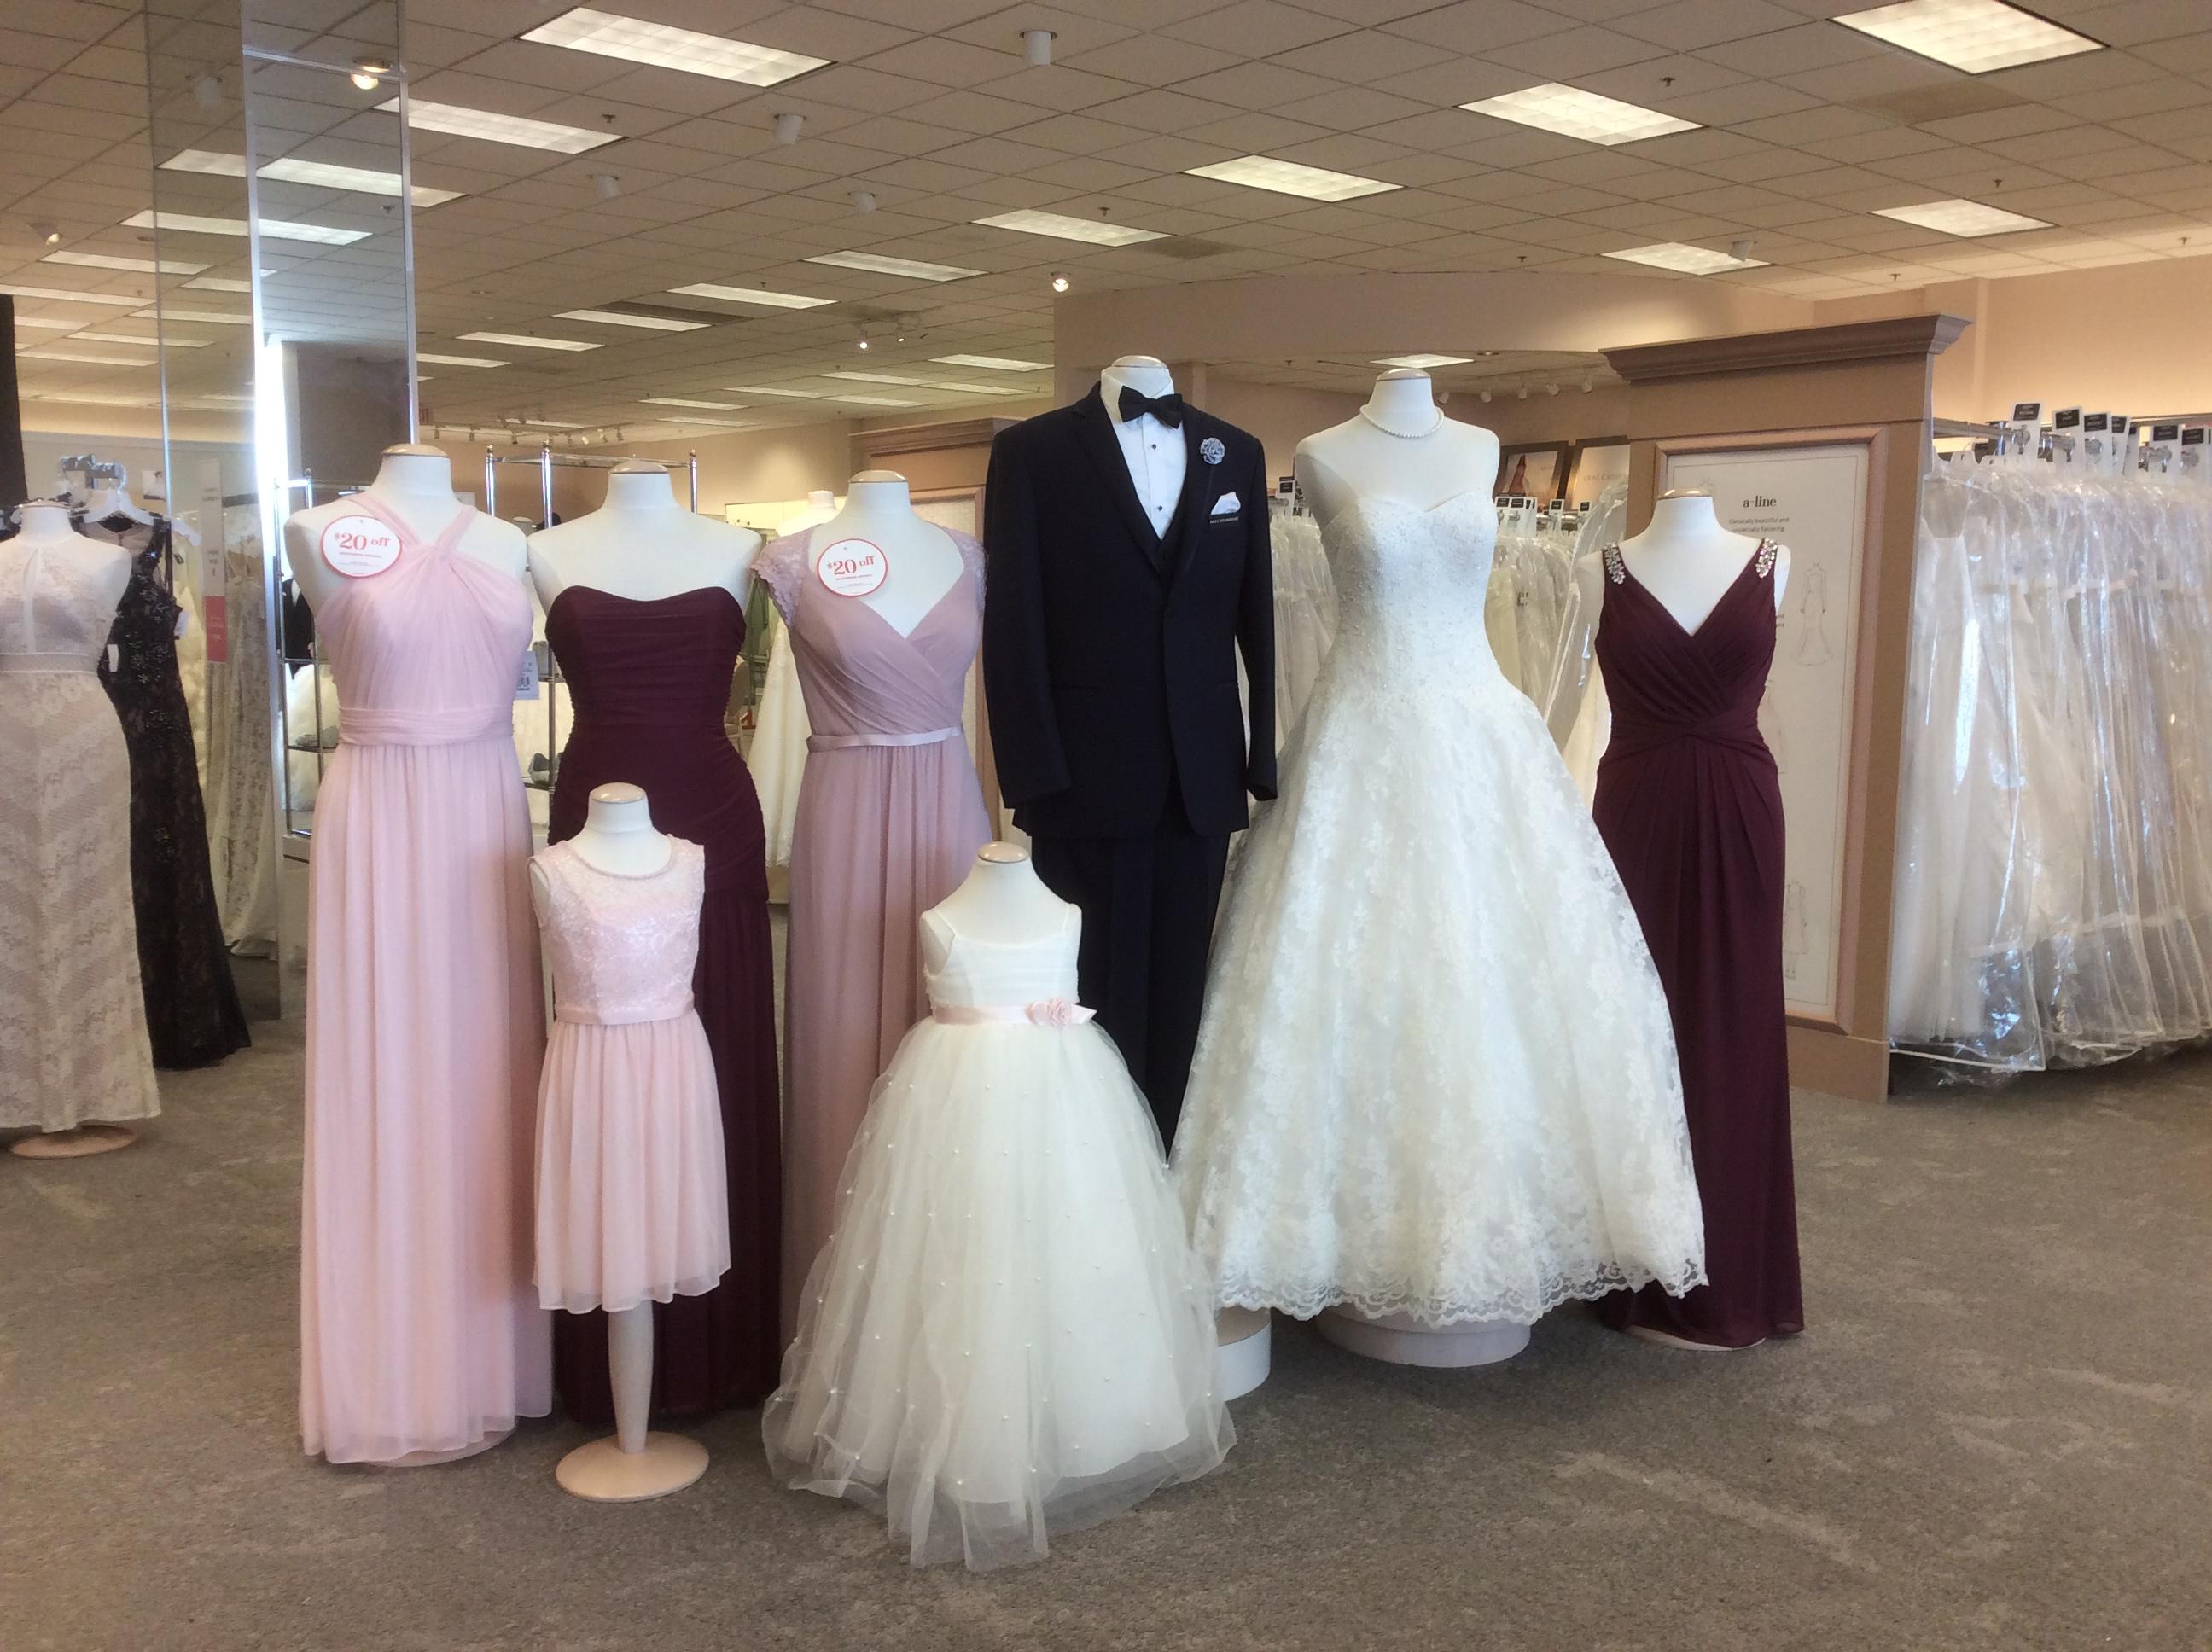 David 39 s bridal in west fargo nd 58078 for Wedding dresses fargo nd